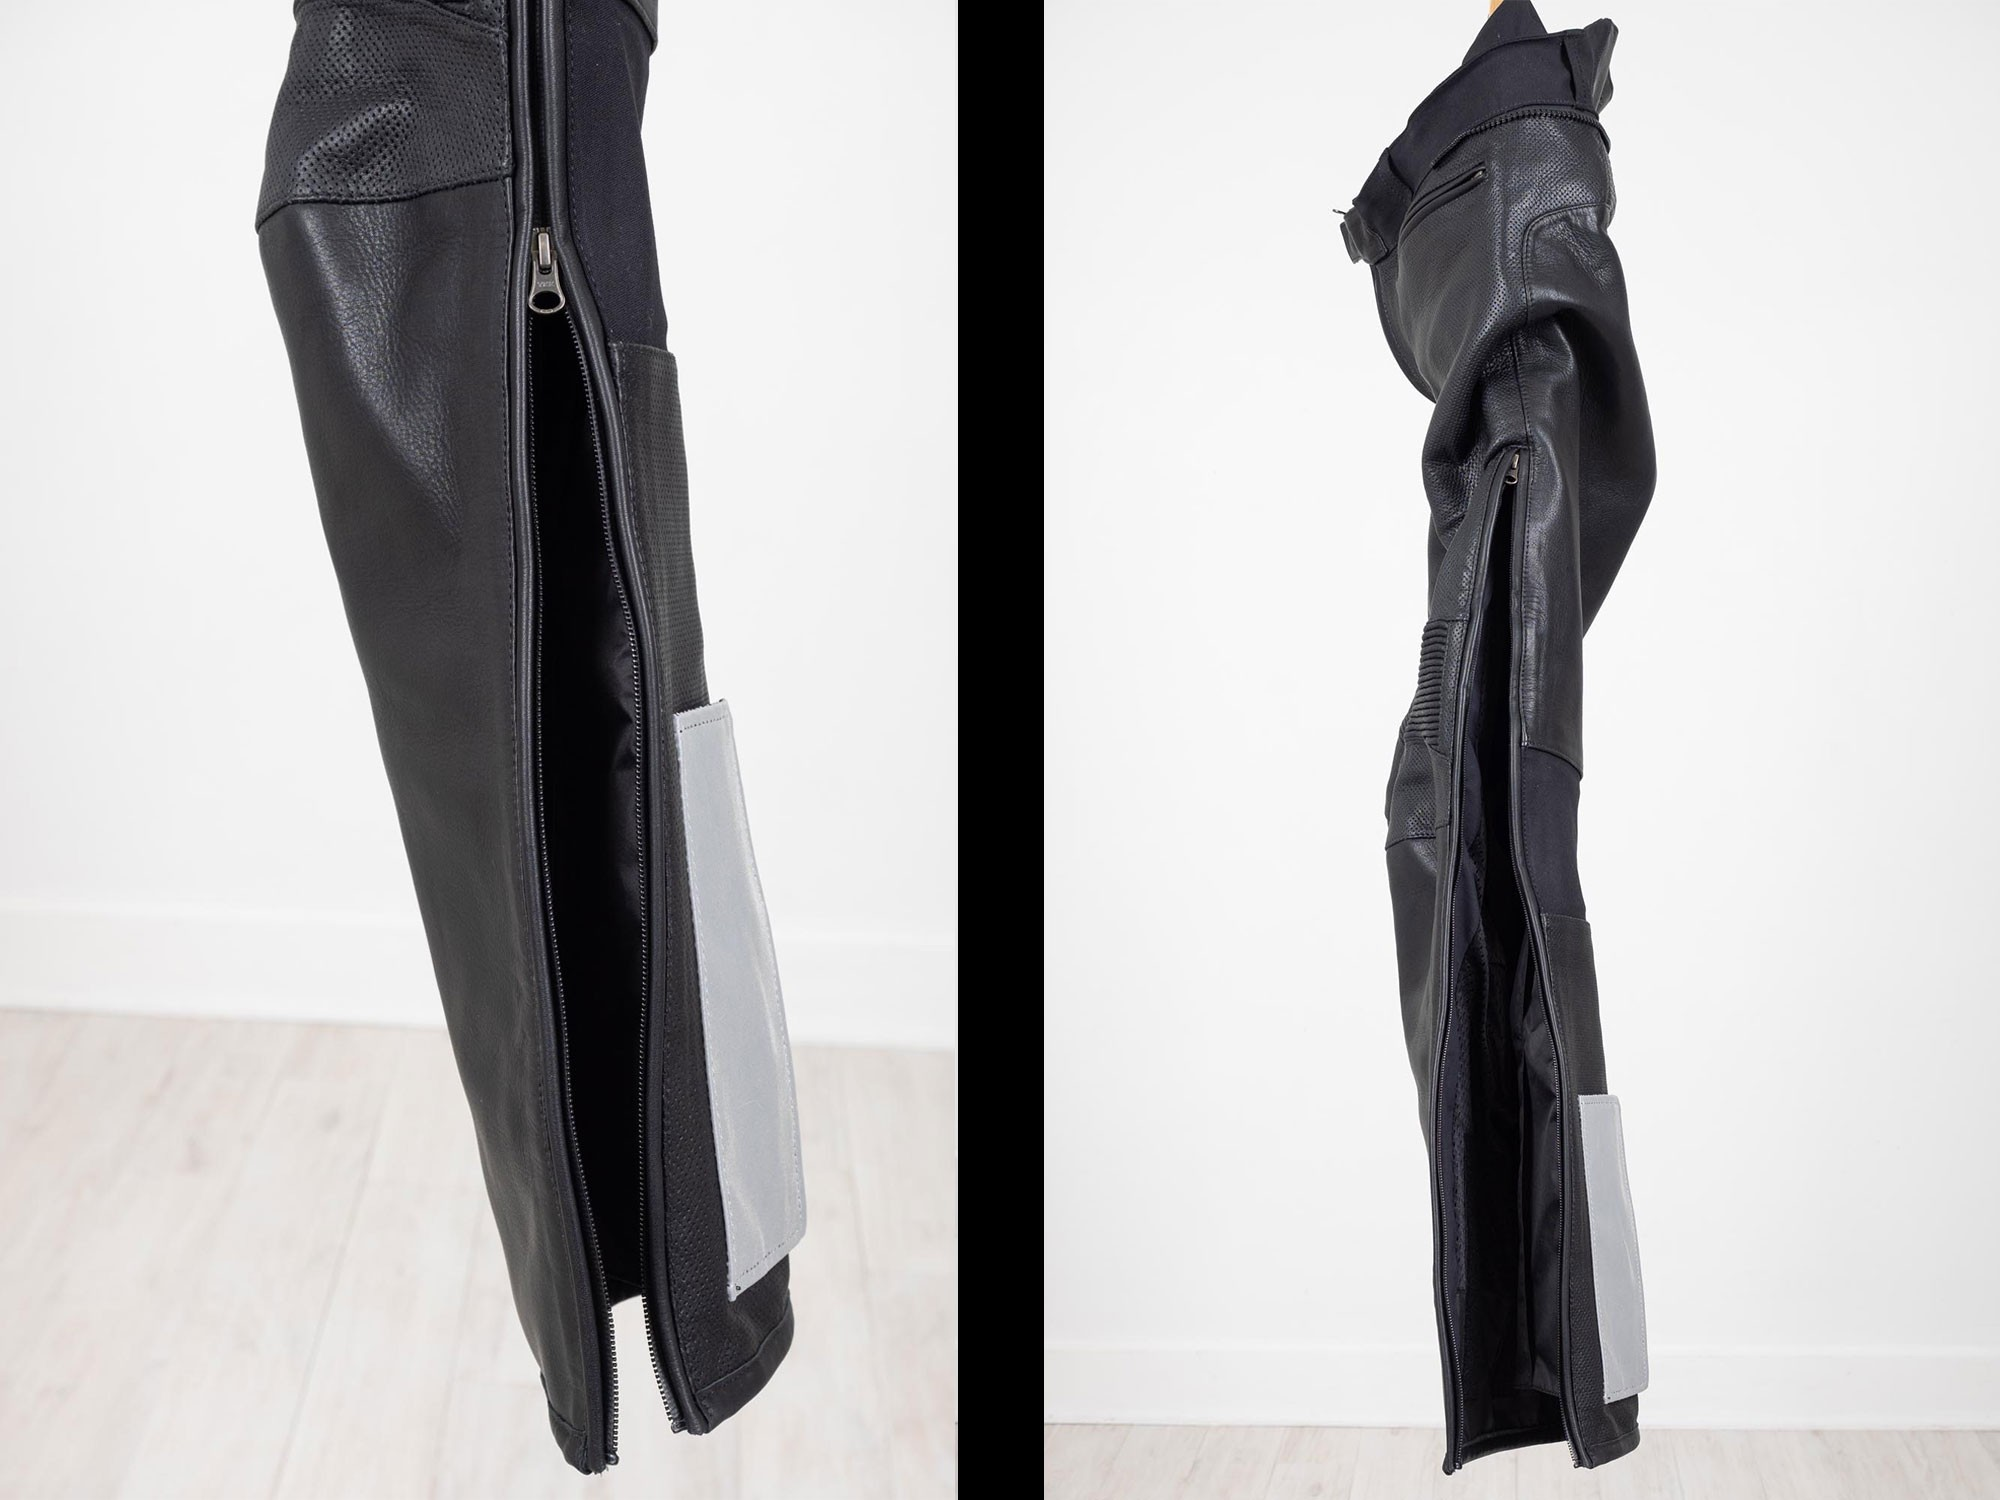 Side view of the Aerostich leg zipper